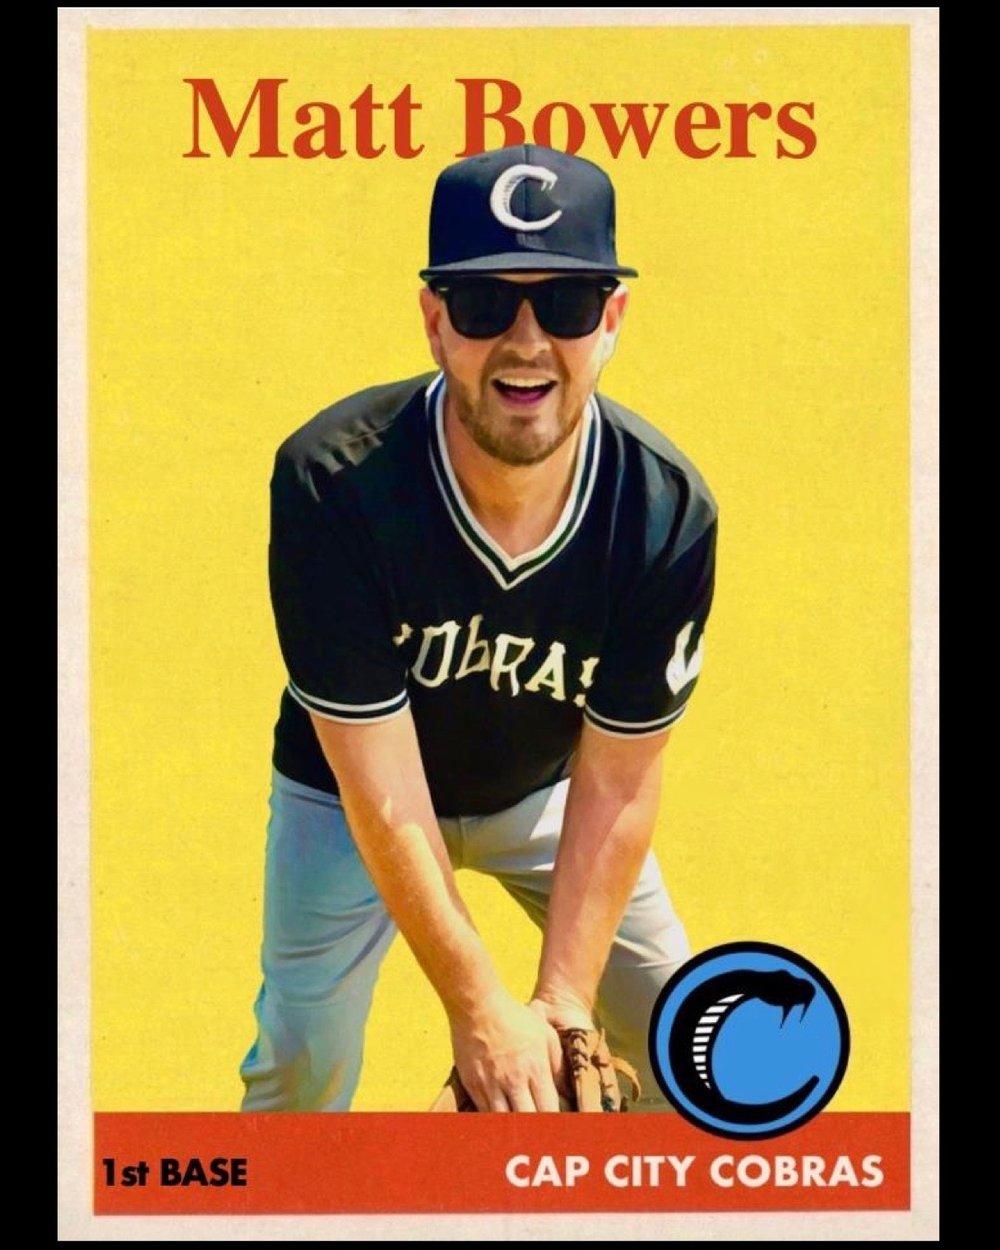 #2 - Matt Bowers